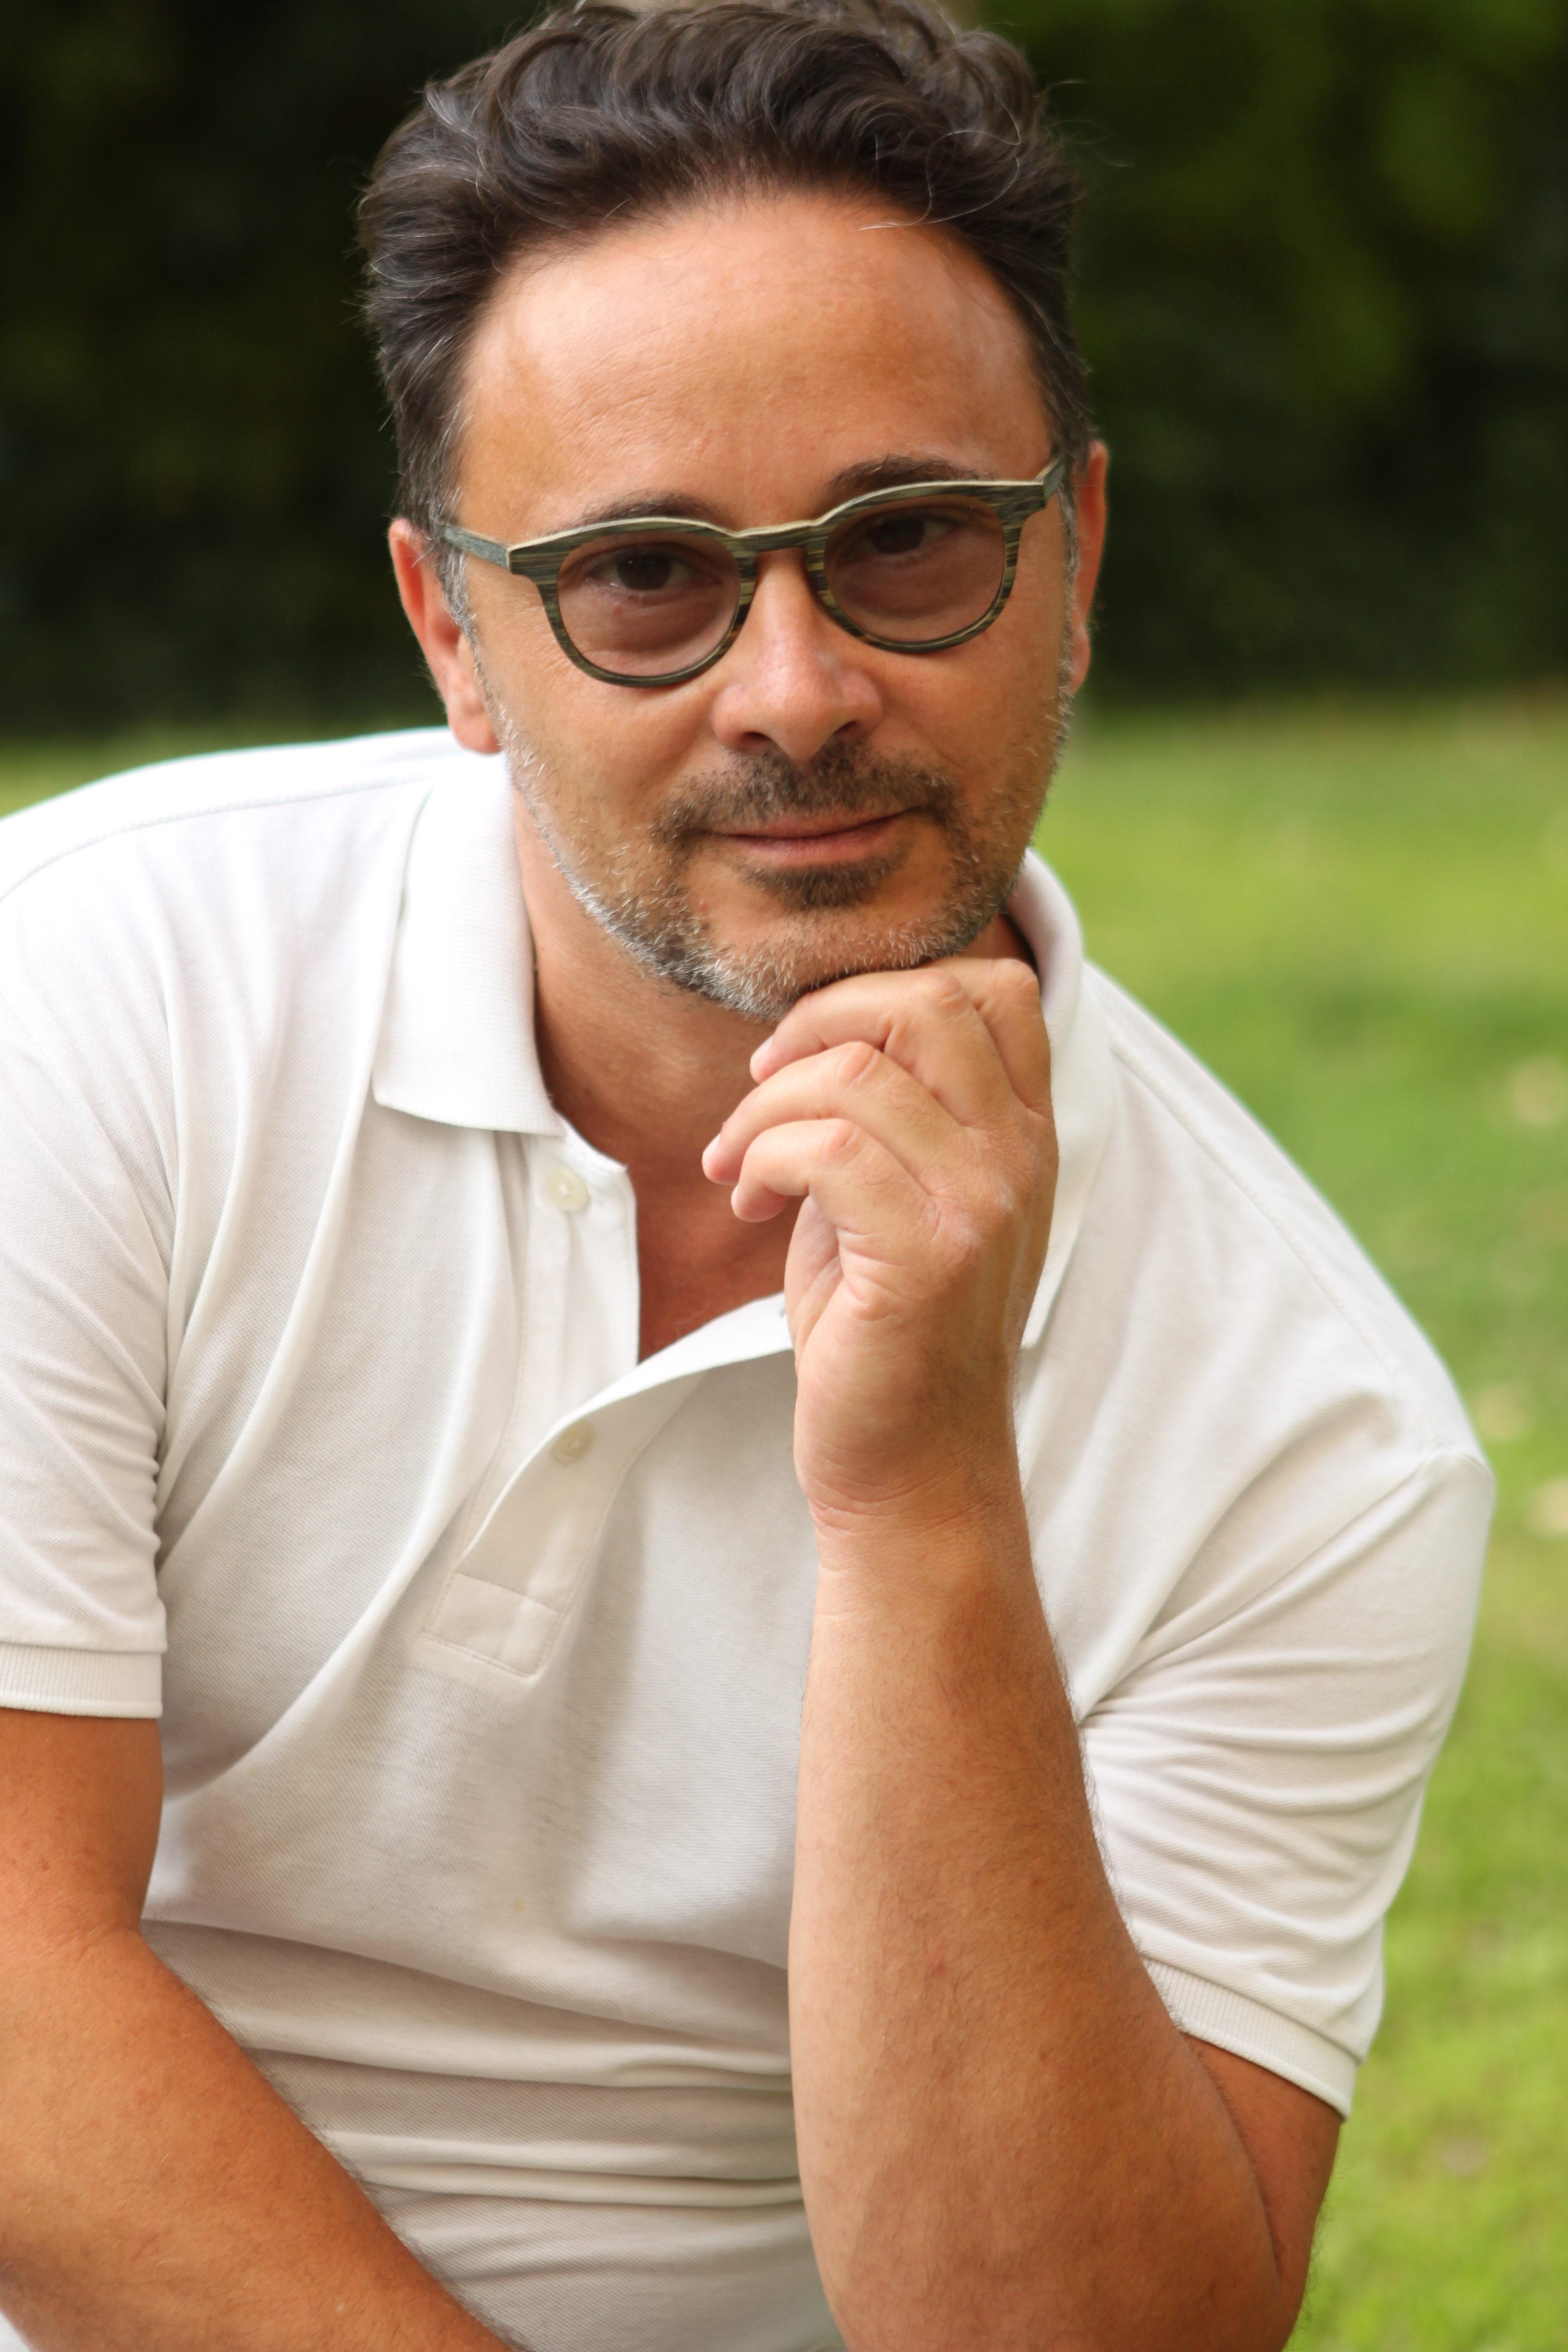 Gianpiero Strangio